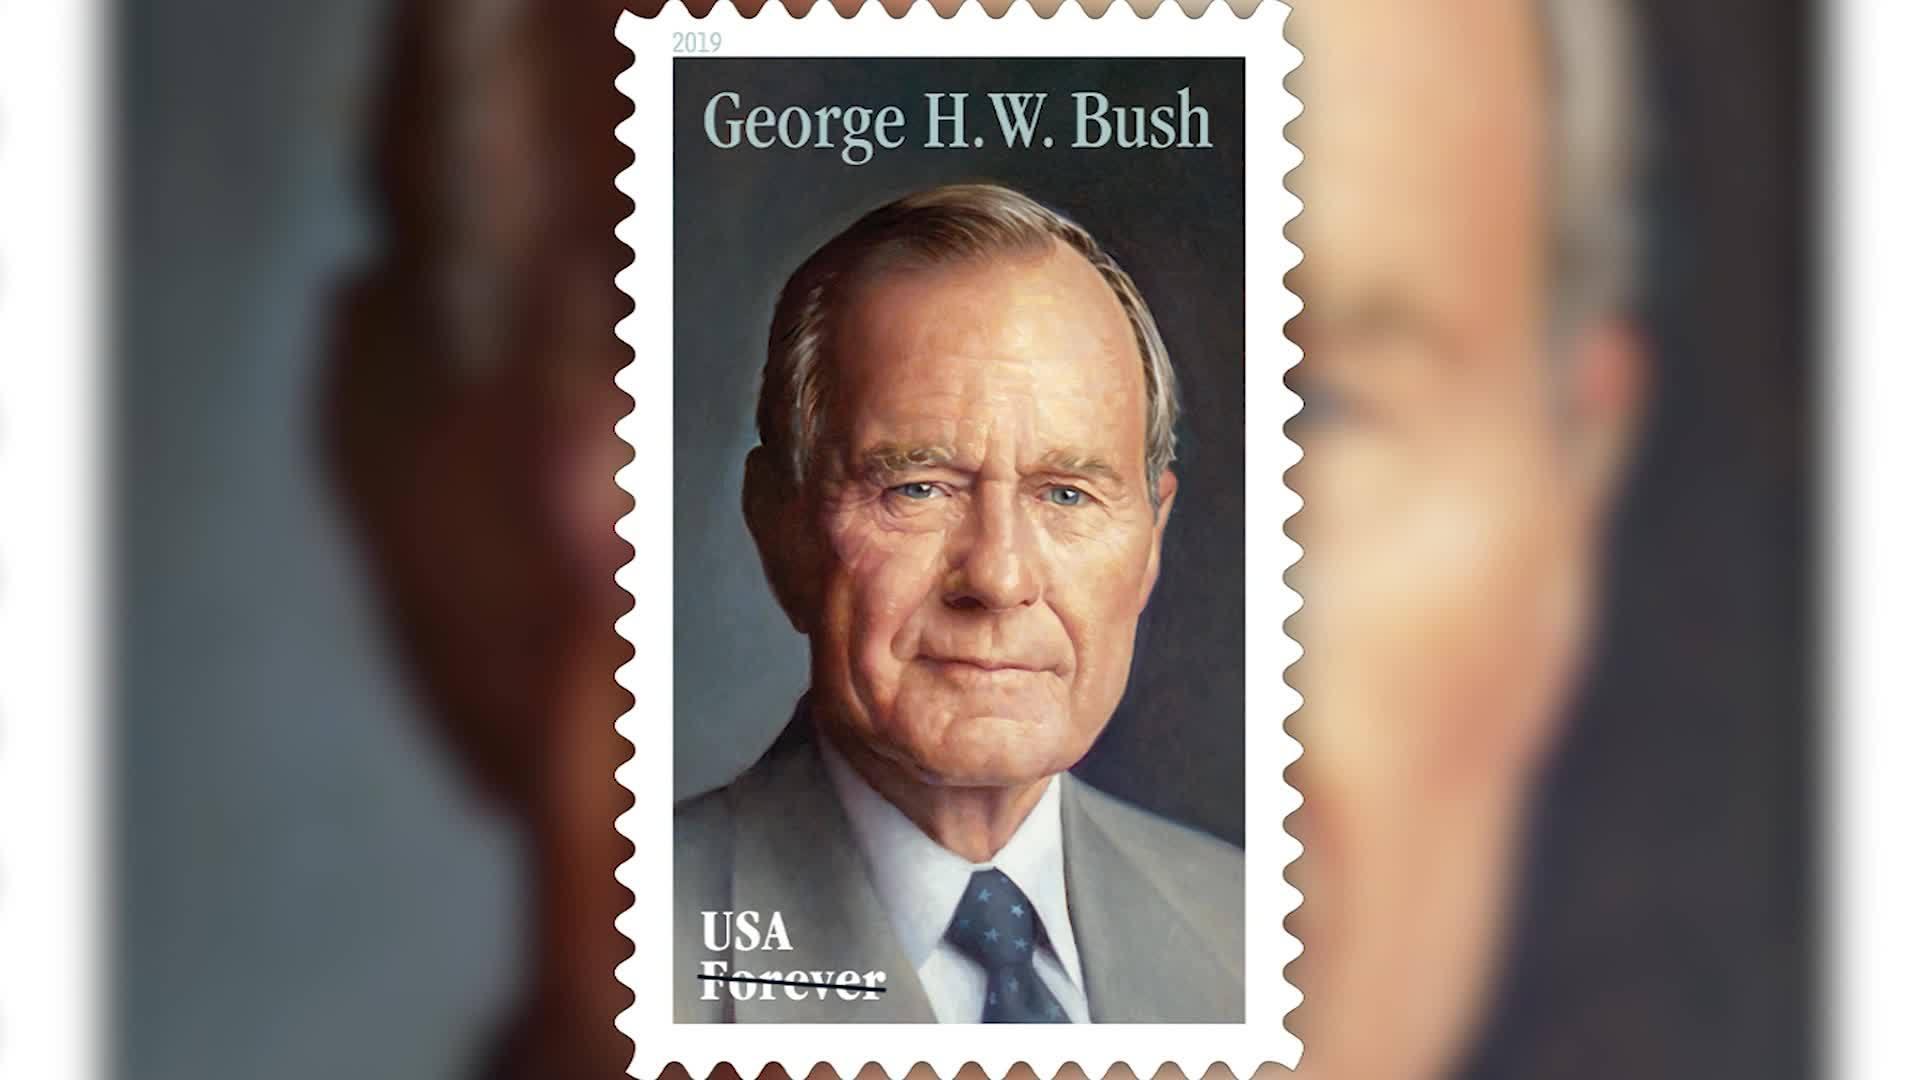 USPS unveils stamp honoring George H. W. Bush